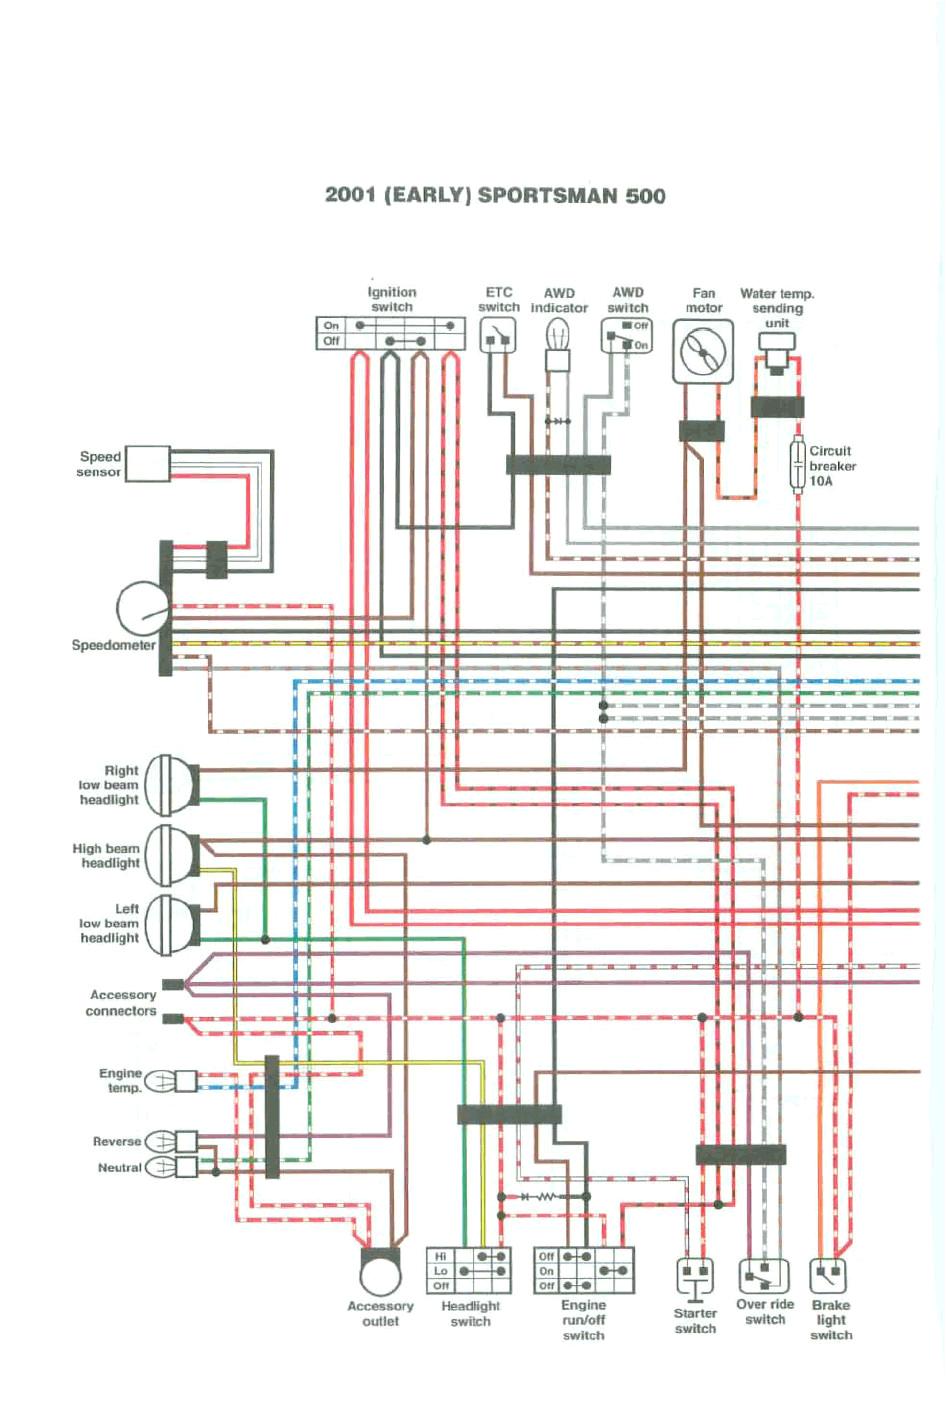 2004 polaris sportsman 400 wiring diagram 2004 polaris sportsman 400 atv wiring diagram wire center u2022 rh ayseesra co 13r jpg